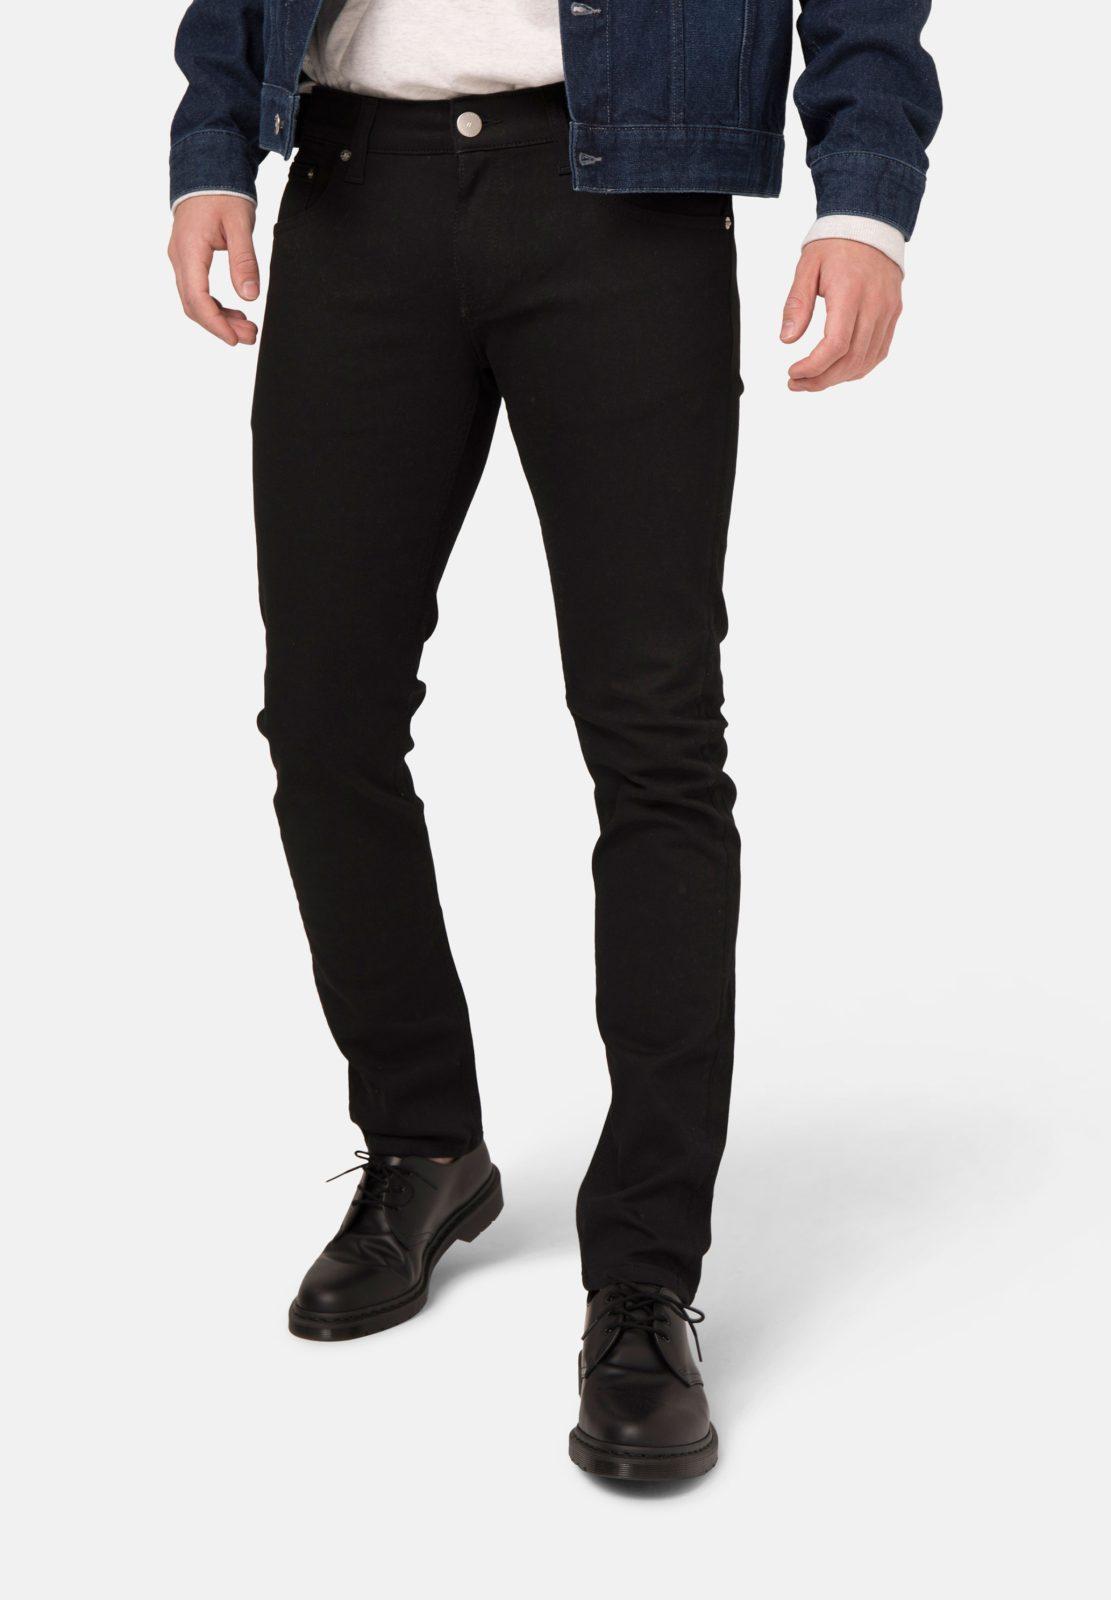 Man-Sustainable-Jeans-Slim-Lassen-Dip-Dry-halffront-22